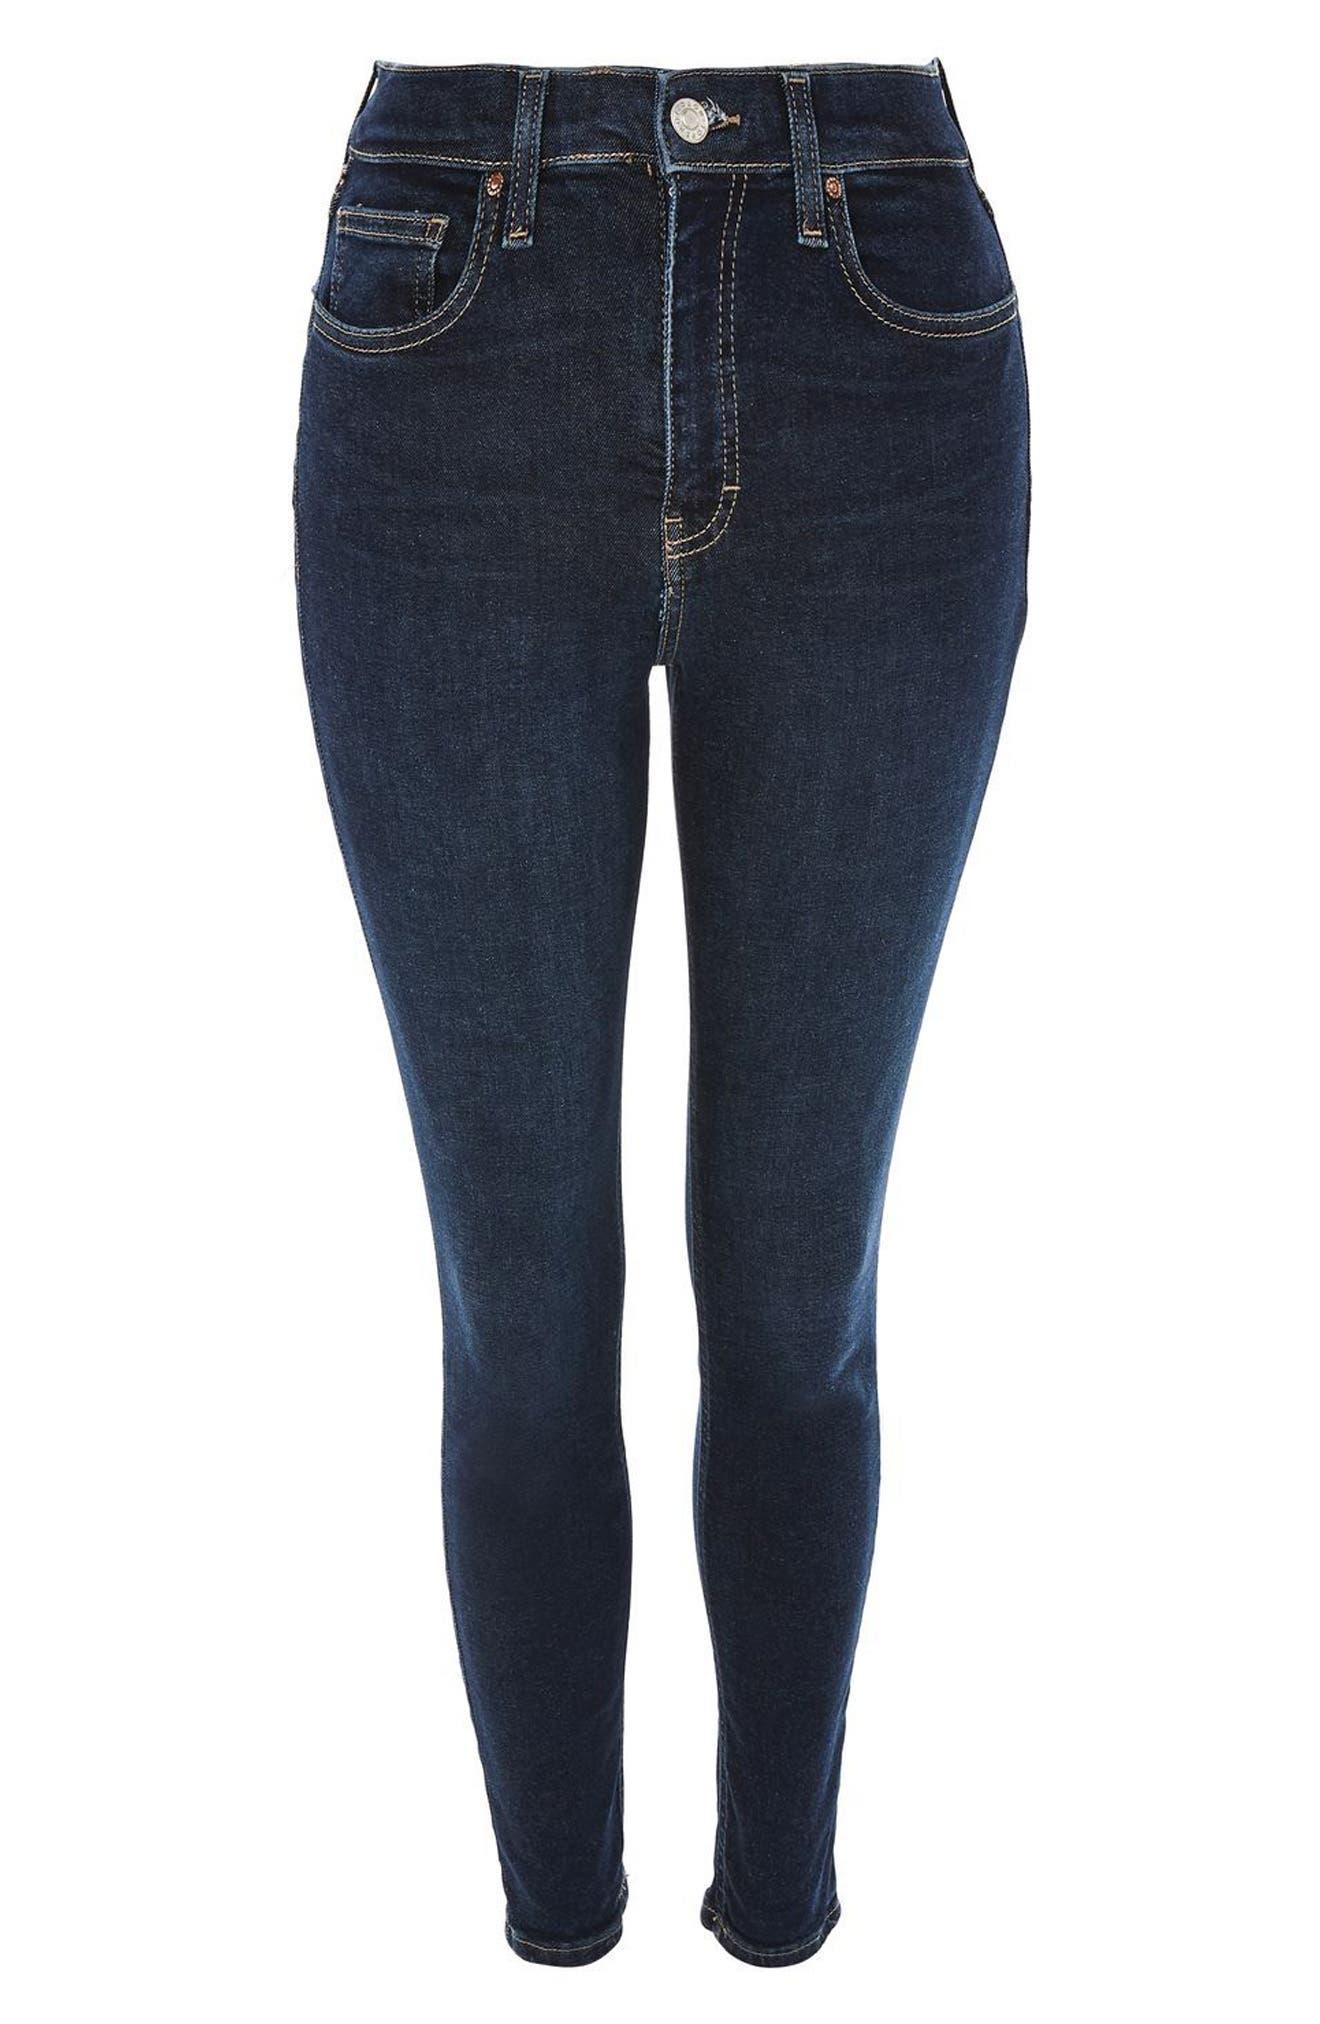 TOPSHOP,                             Jamie High Waist Ankle Skinny Jeans,                             Alternate thumbnail 5, color,                             401